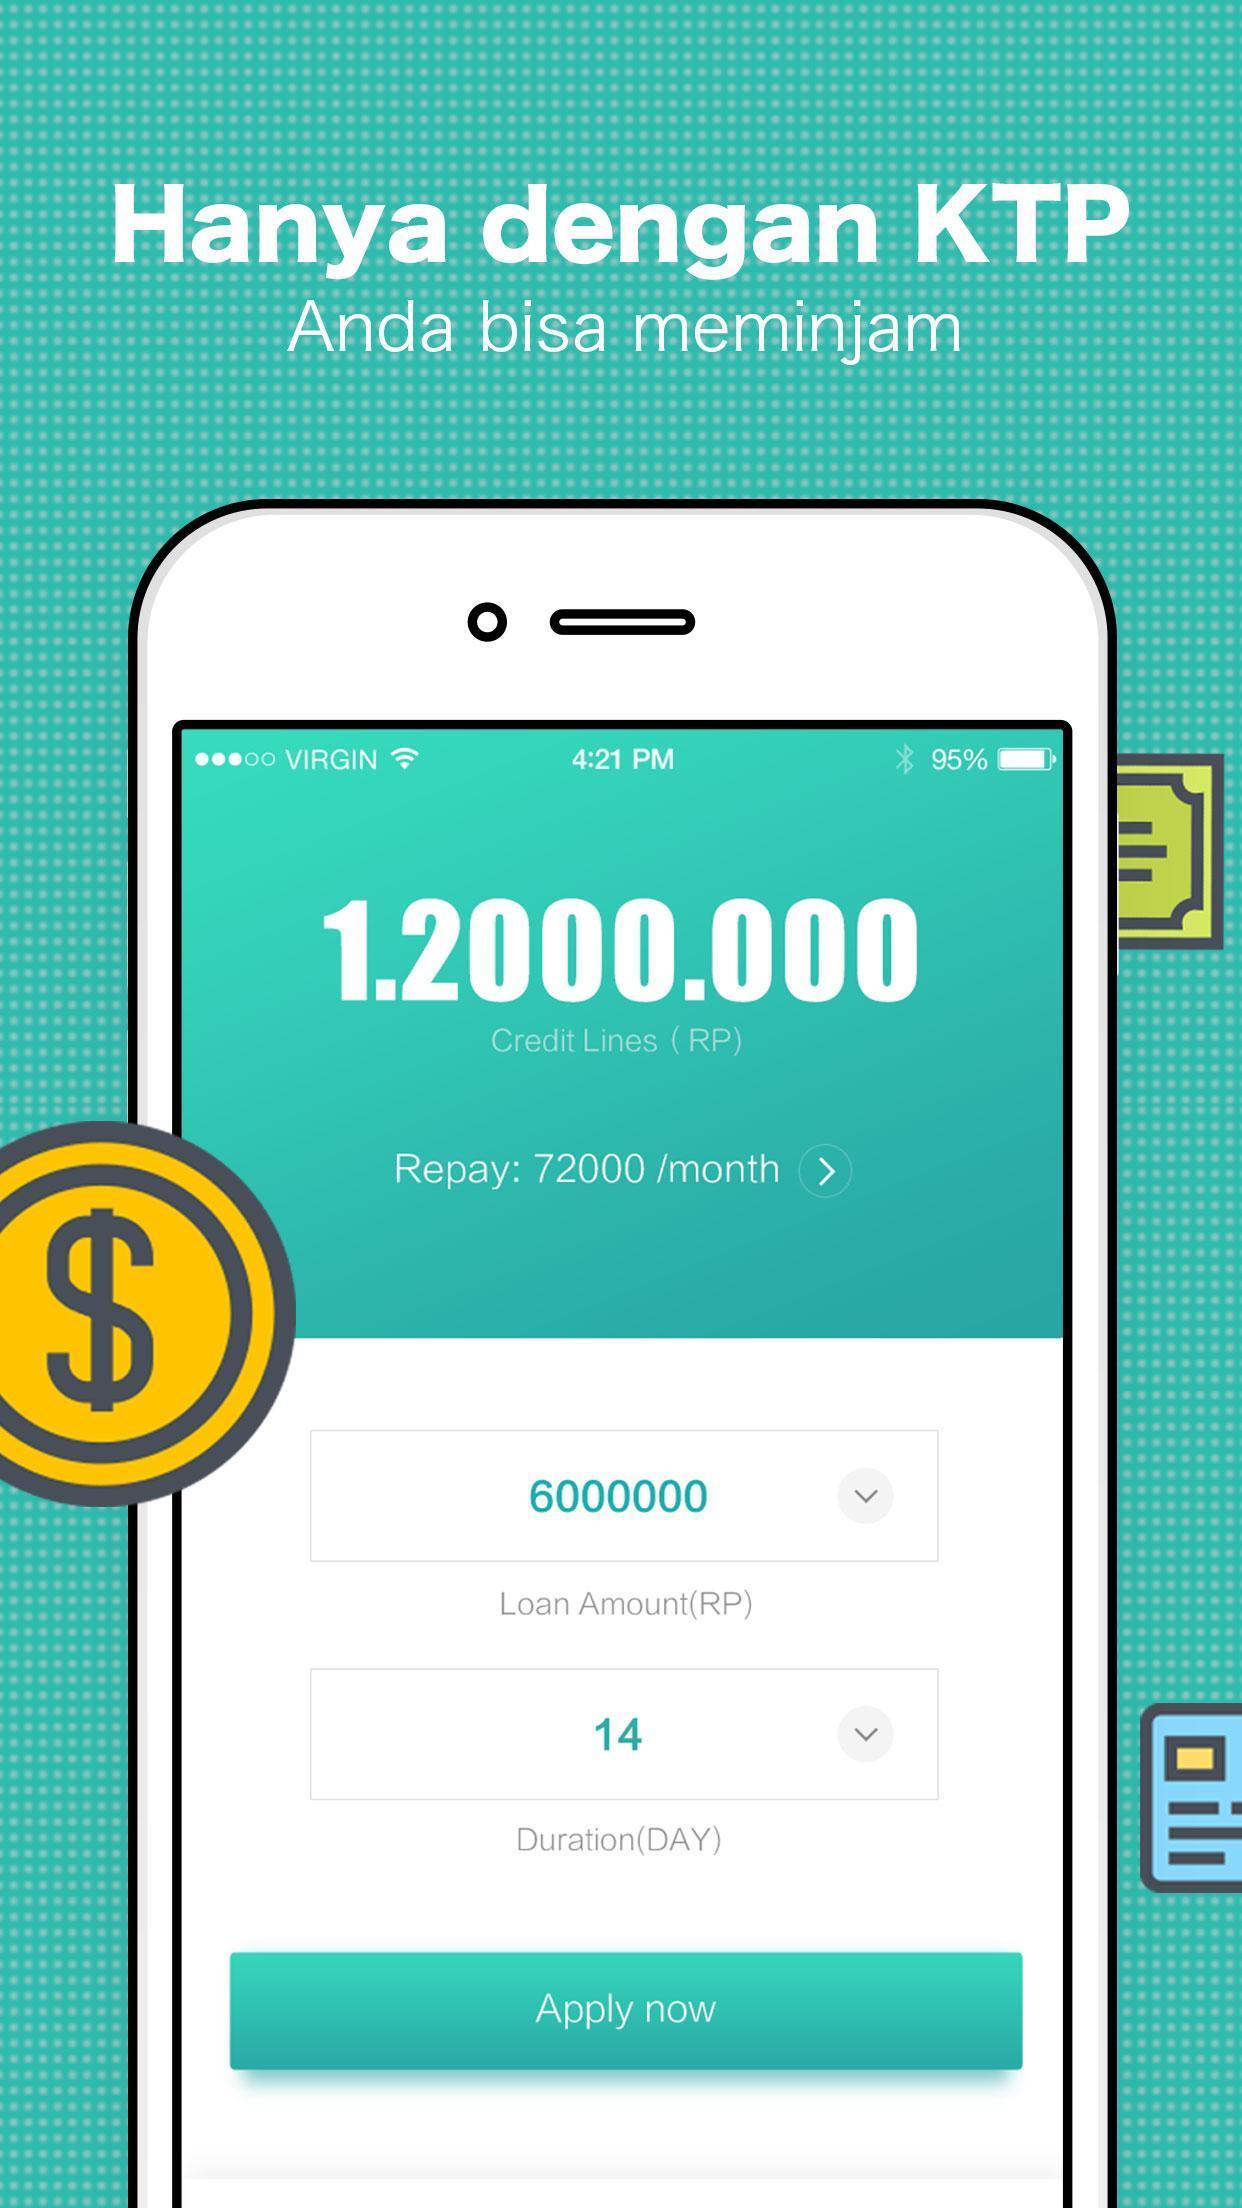 Danapintar Pinjaman Uang Online Tanpa Jaminan For Android Apk